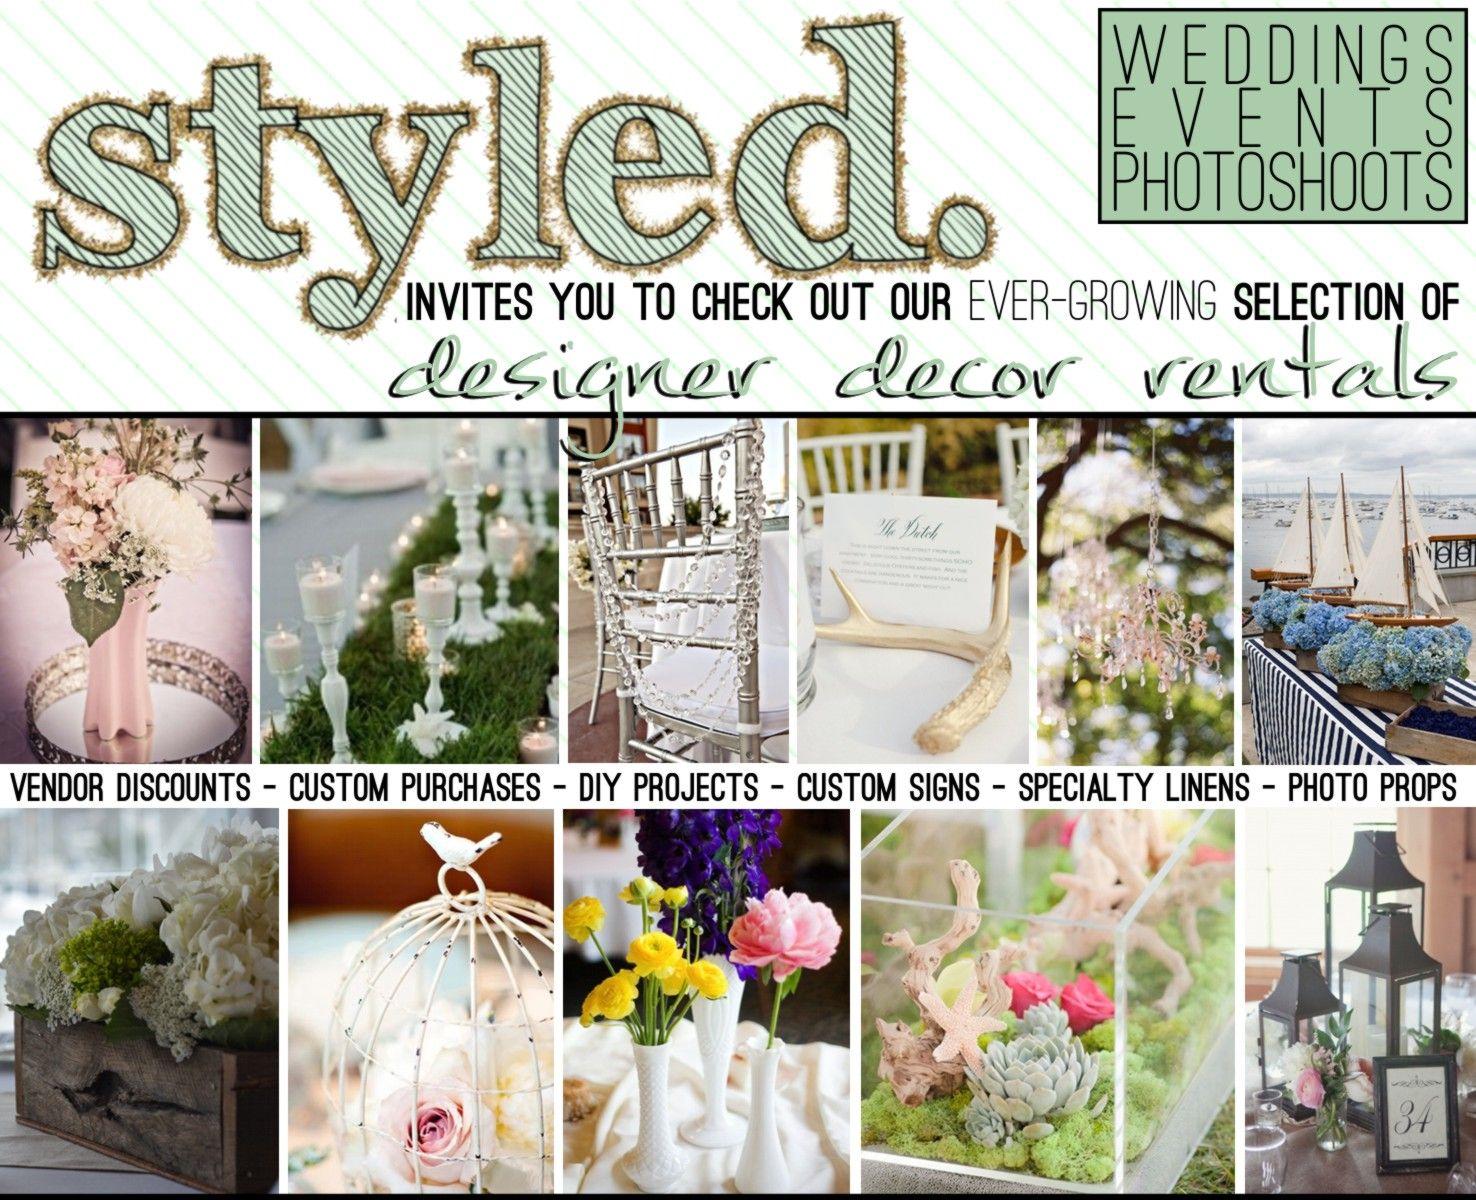 Styled Wedding Decoration Rentals Some Amazing And Original Stuff Wedding Decorations Event Invitation Wedding Events